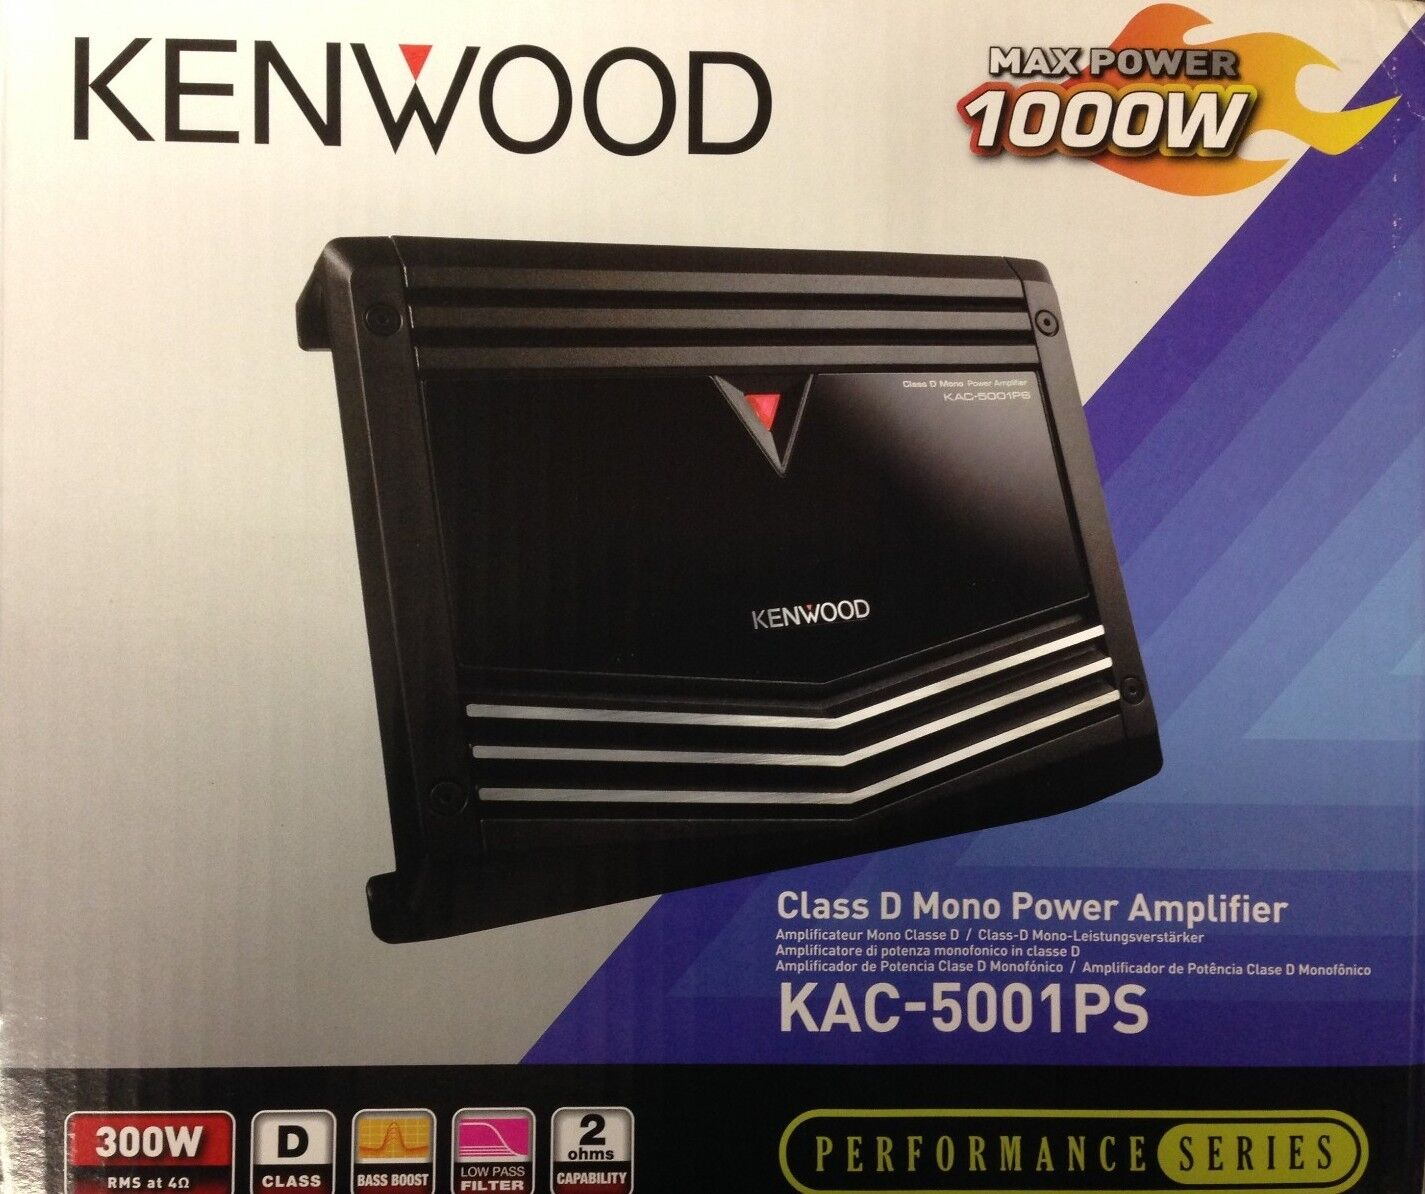 Kenwood KAC 5001PS Performance Series 1000W Class D Mono Channel Car Amplifier